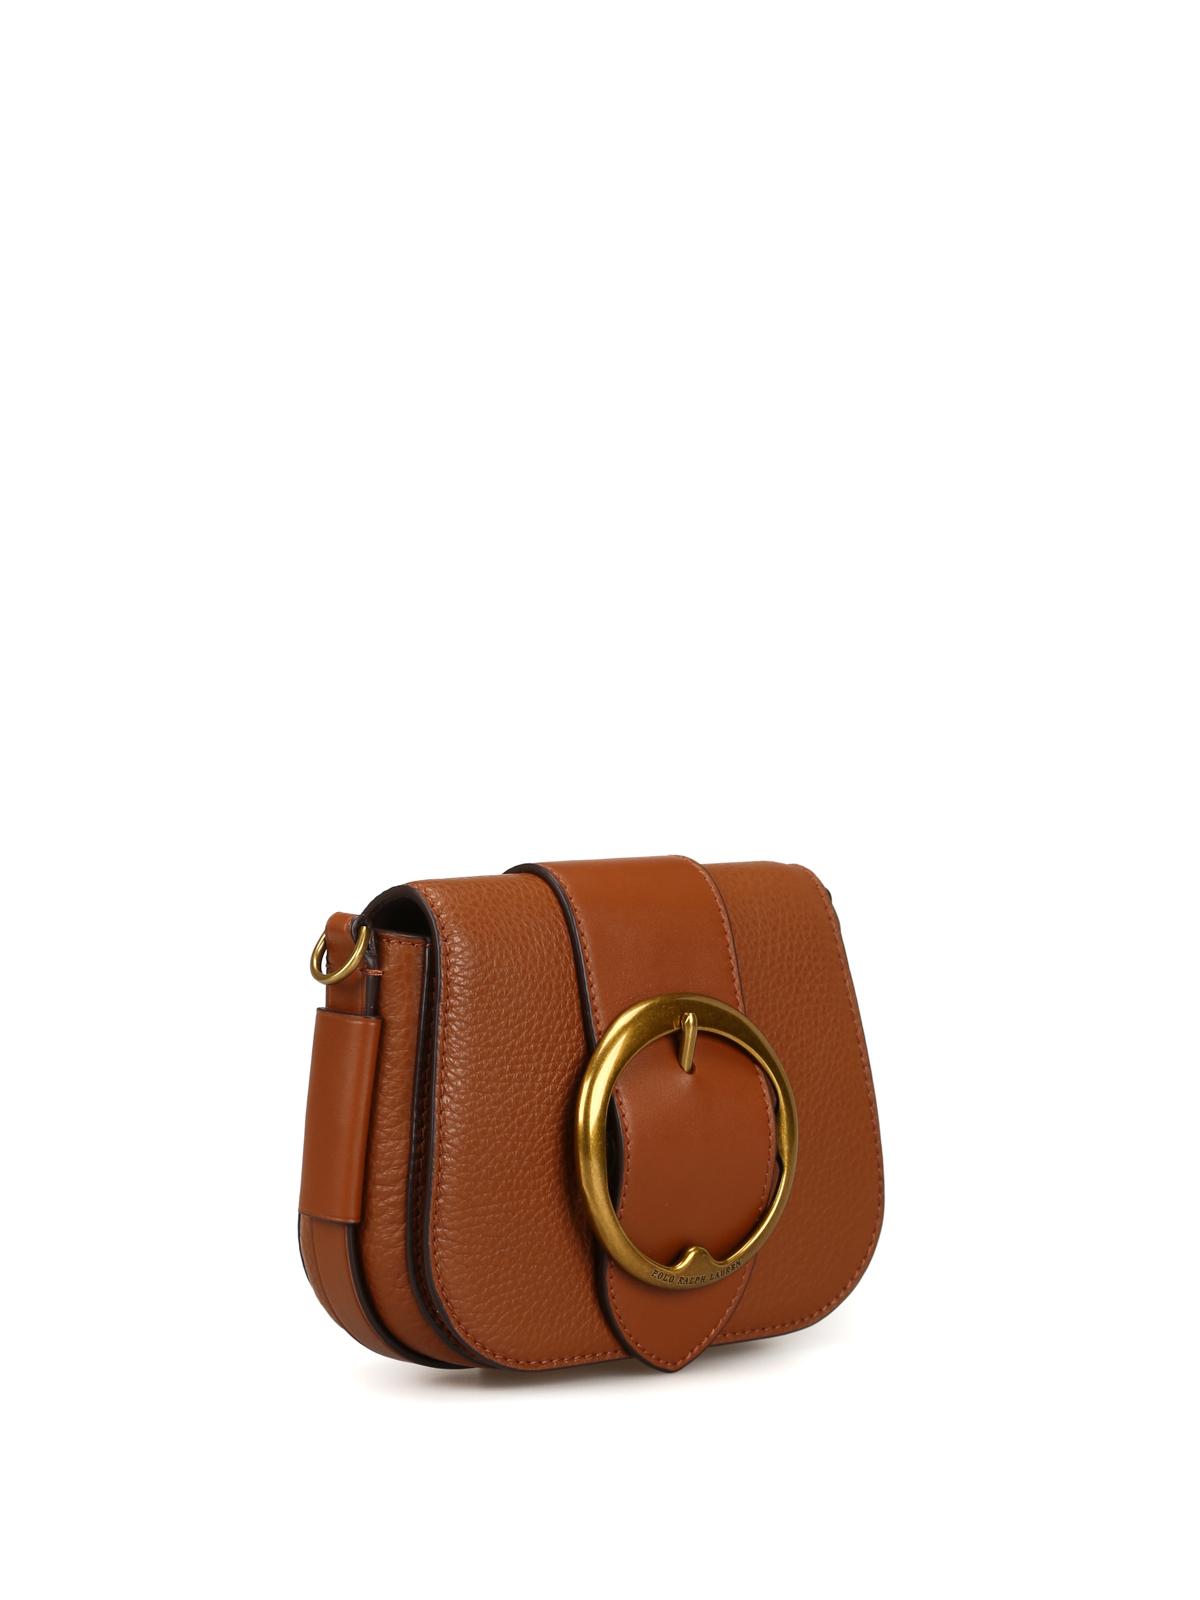 dd123cd75f POLO RALPH LAUREN  shoulder bags online - Lennox Mini brown leather shoulder  bag